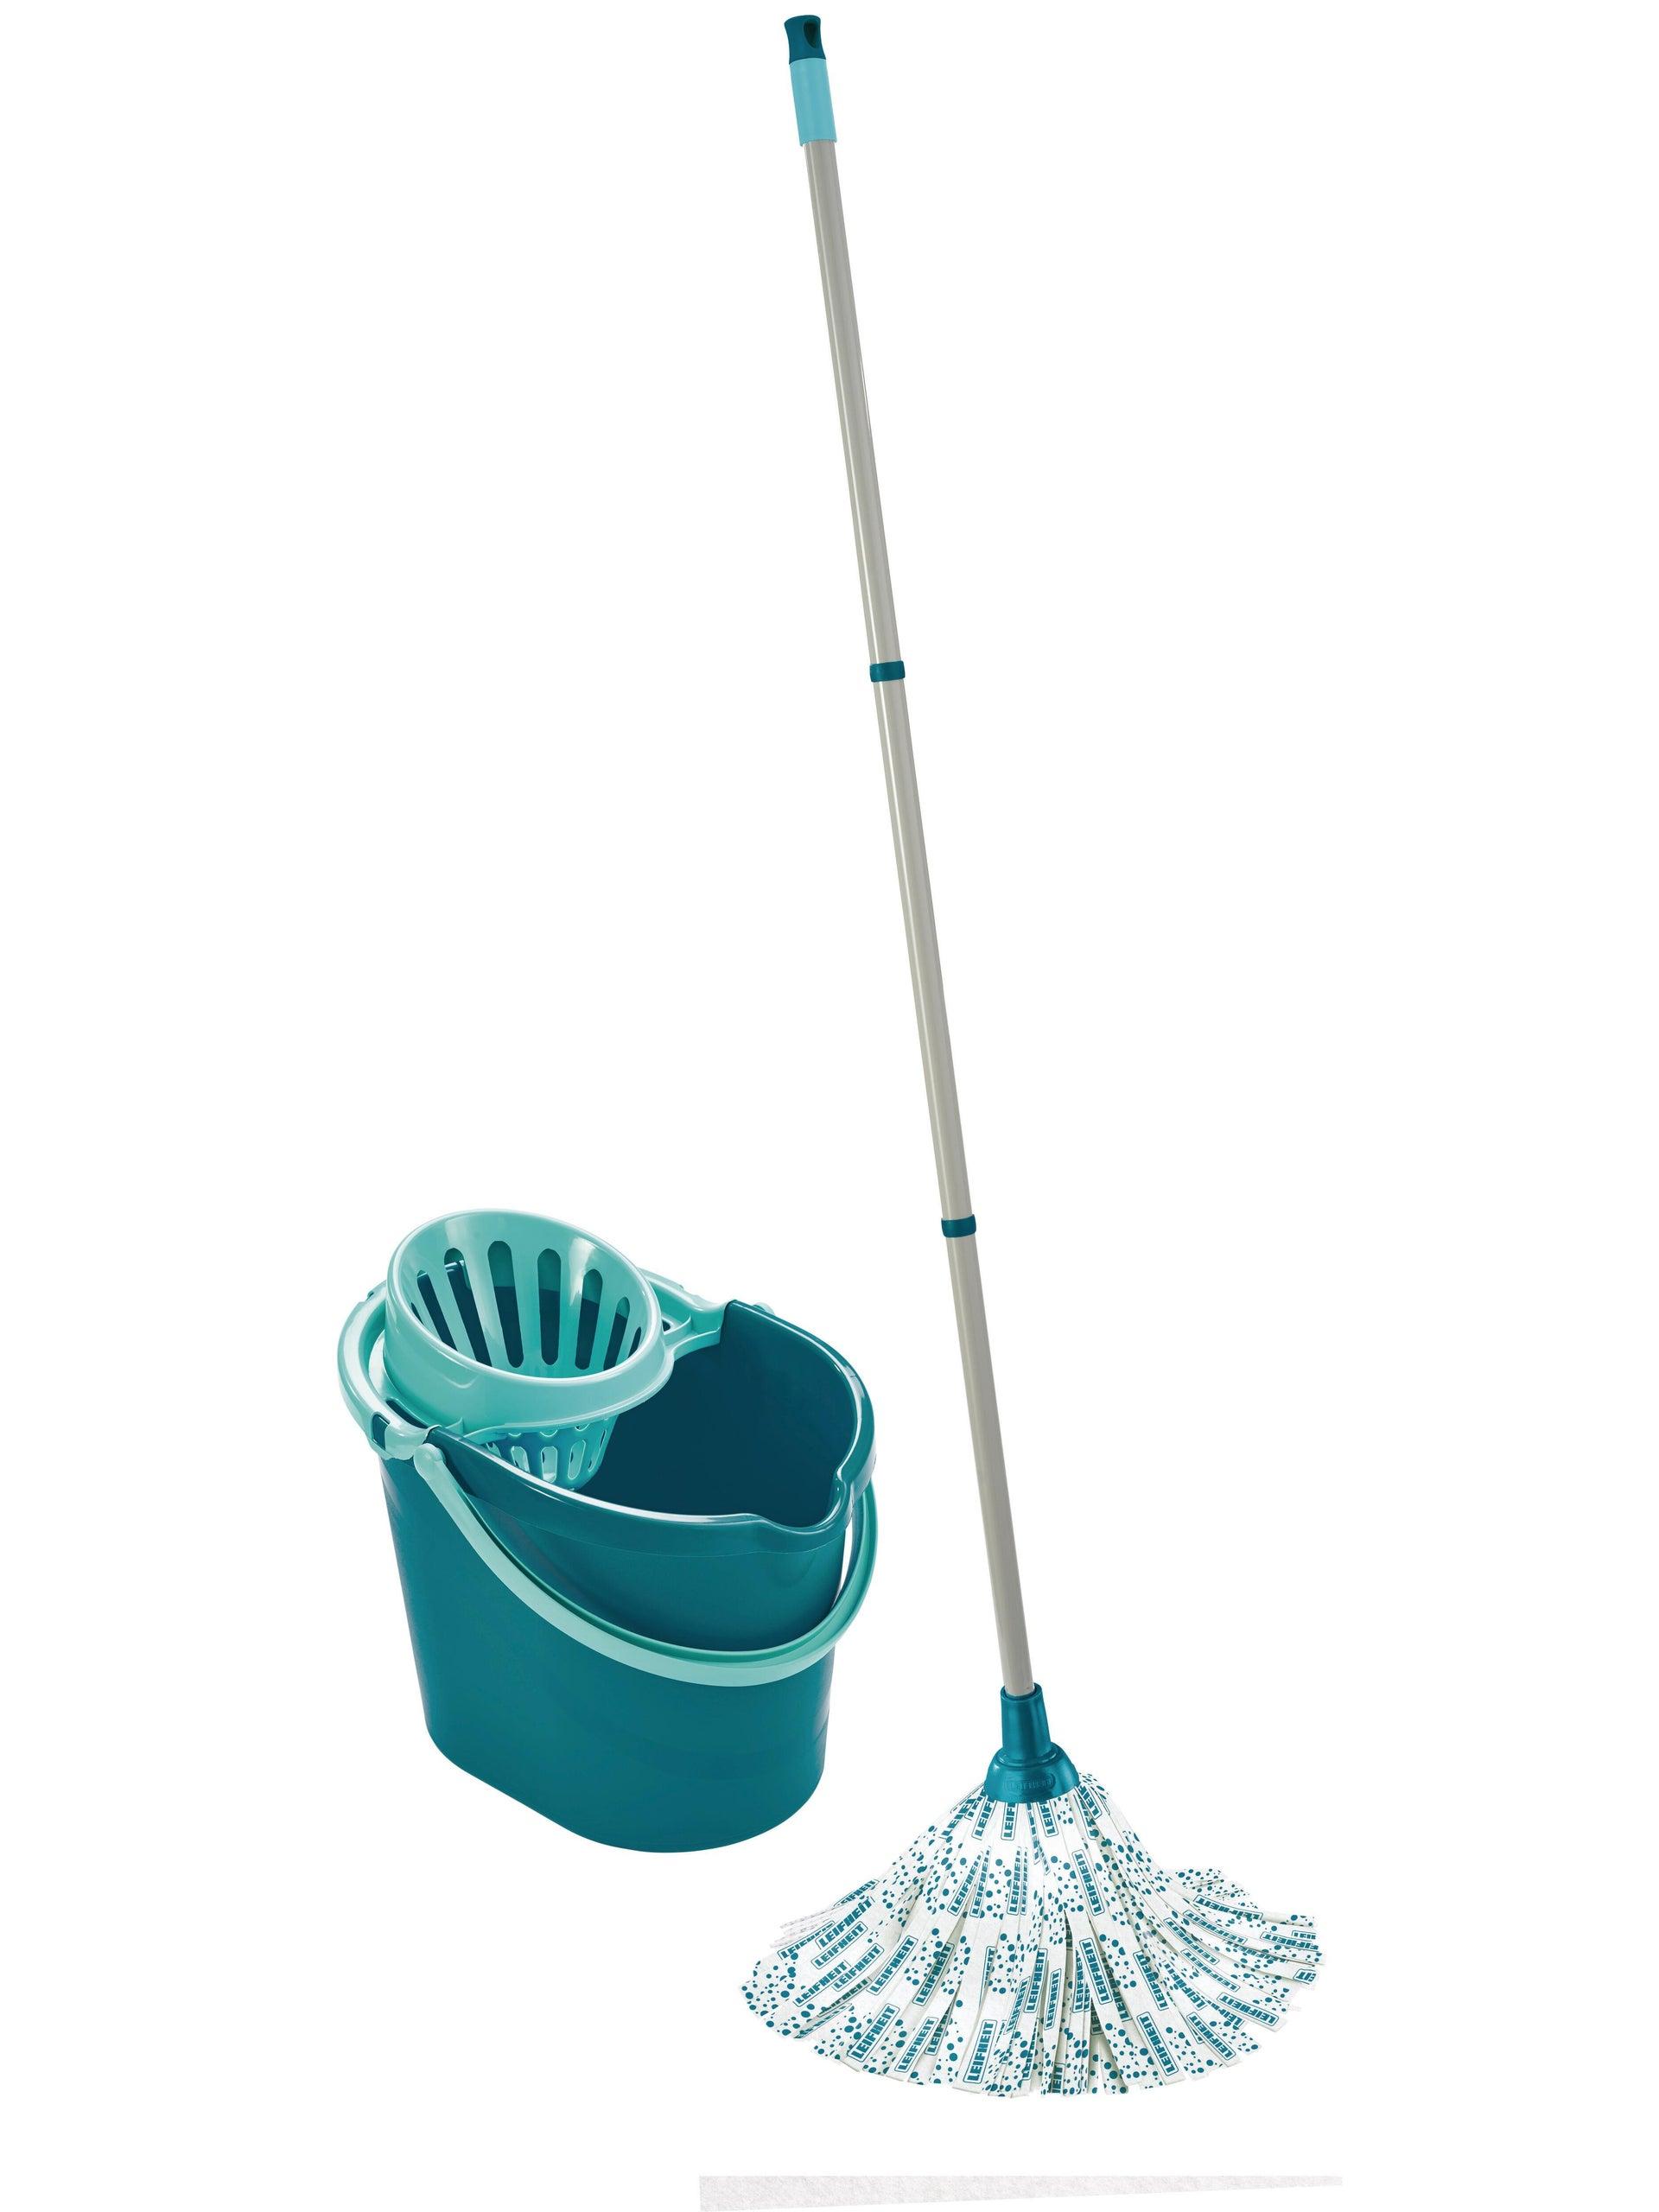 Mocio LEIFHEIT Set lavapavimenti Classic Mop in cotone - 4